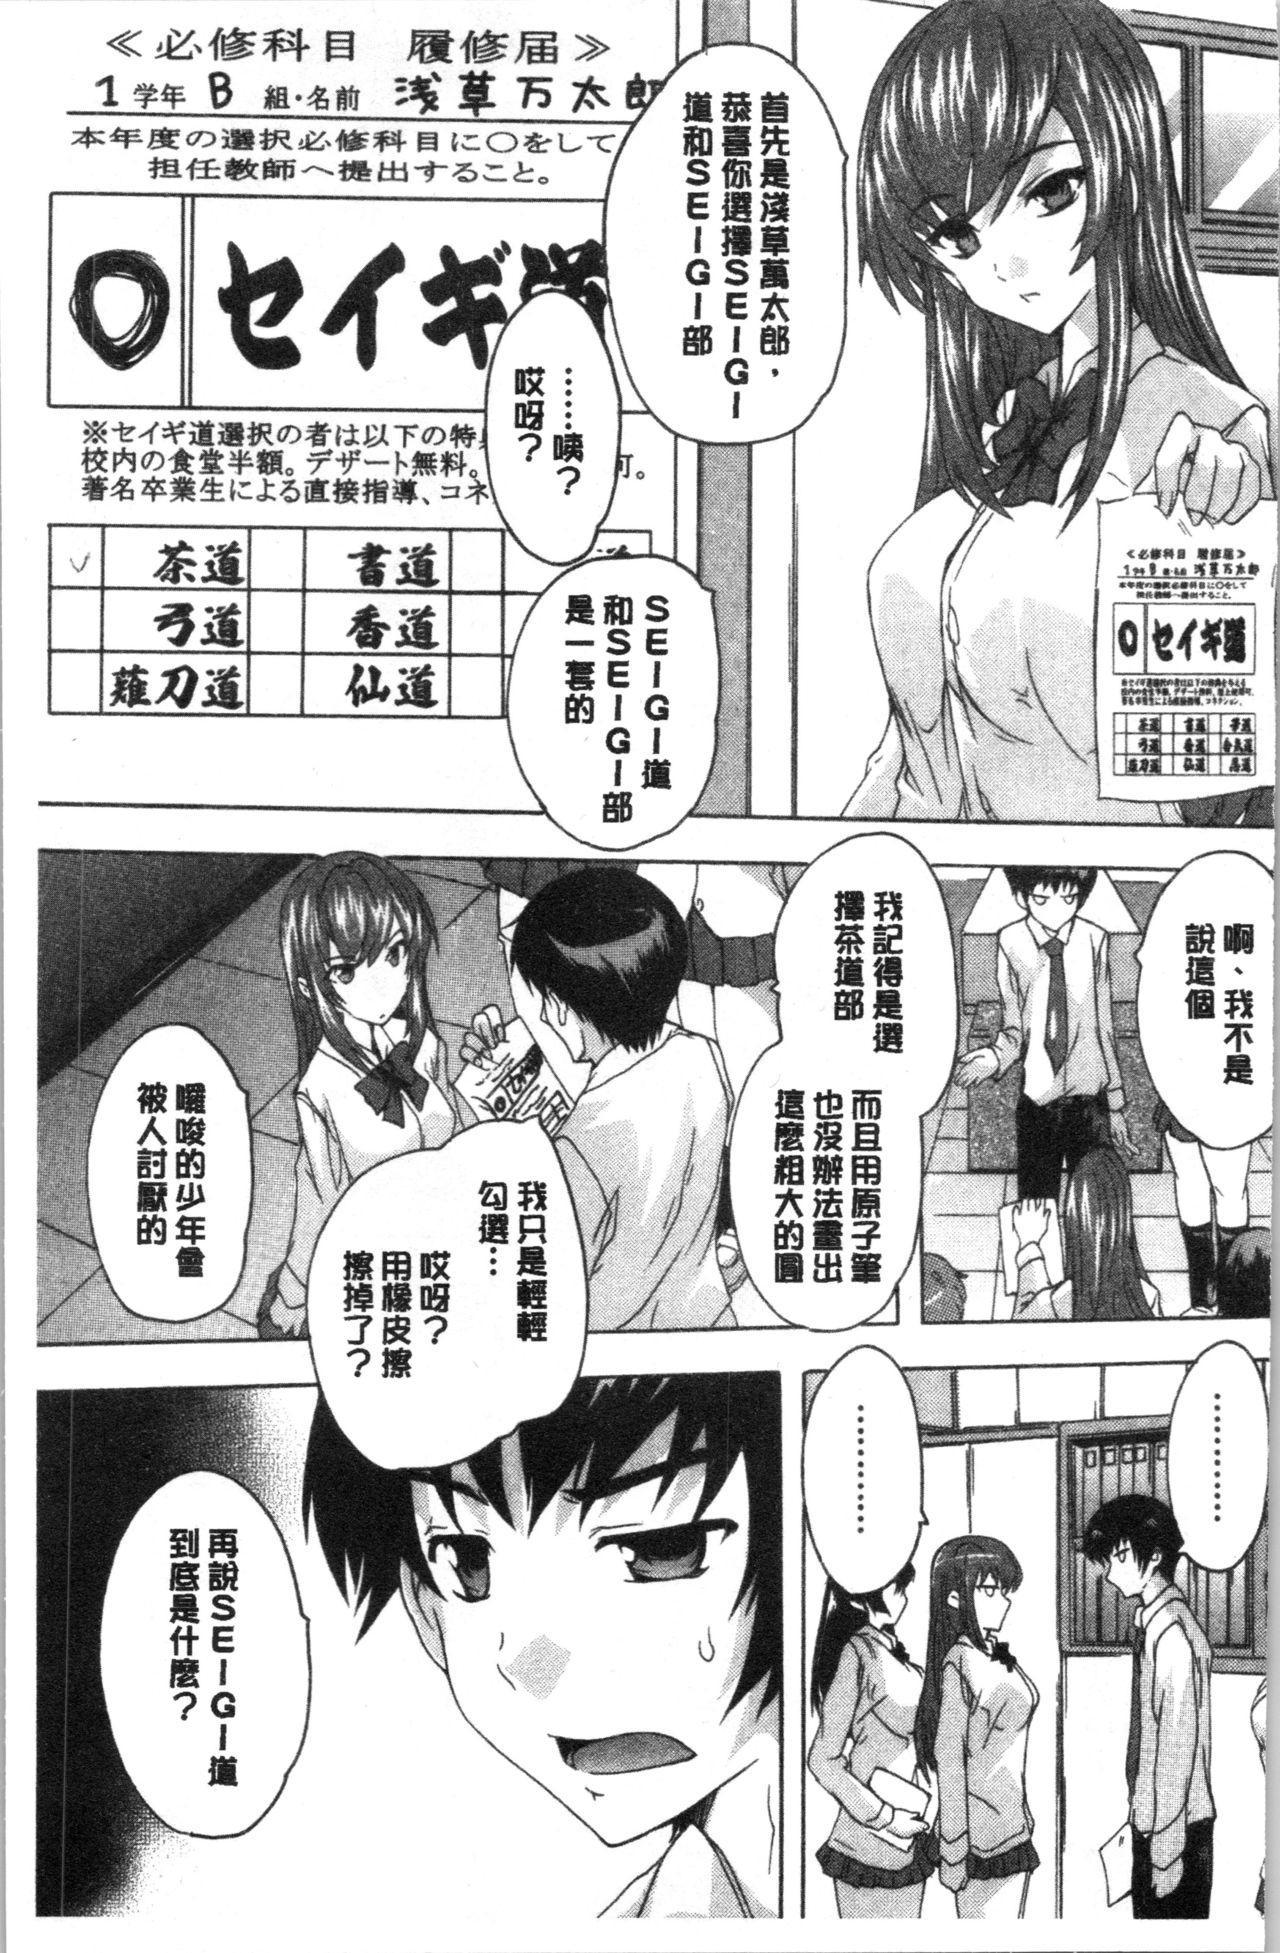 [Natsuka Q-Ya] Hisshuu!! Sex-bu - SEIGI-DO The Ultimate Martial Arts   必修!!性愛淫交部 [Chinese] 7